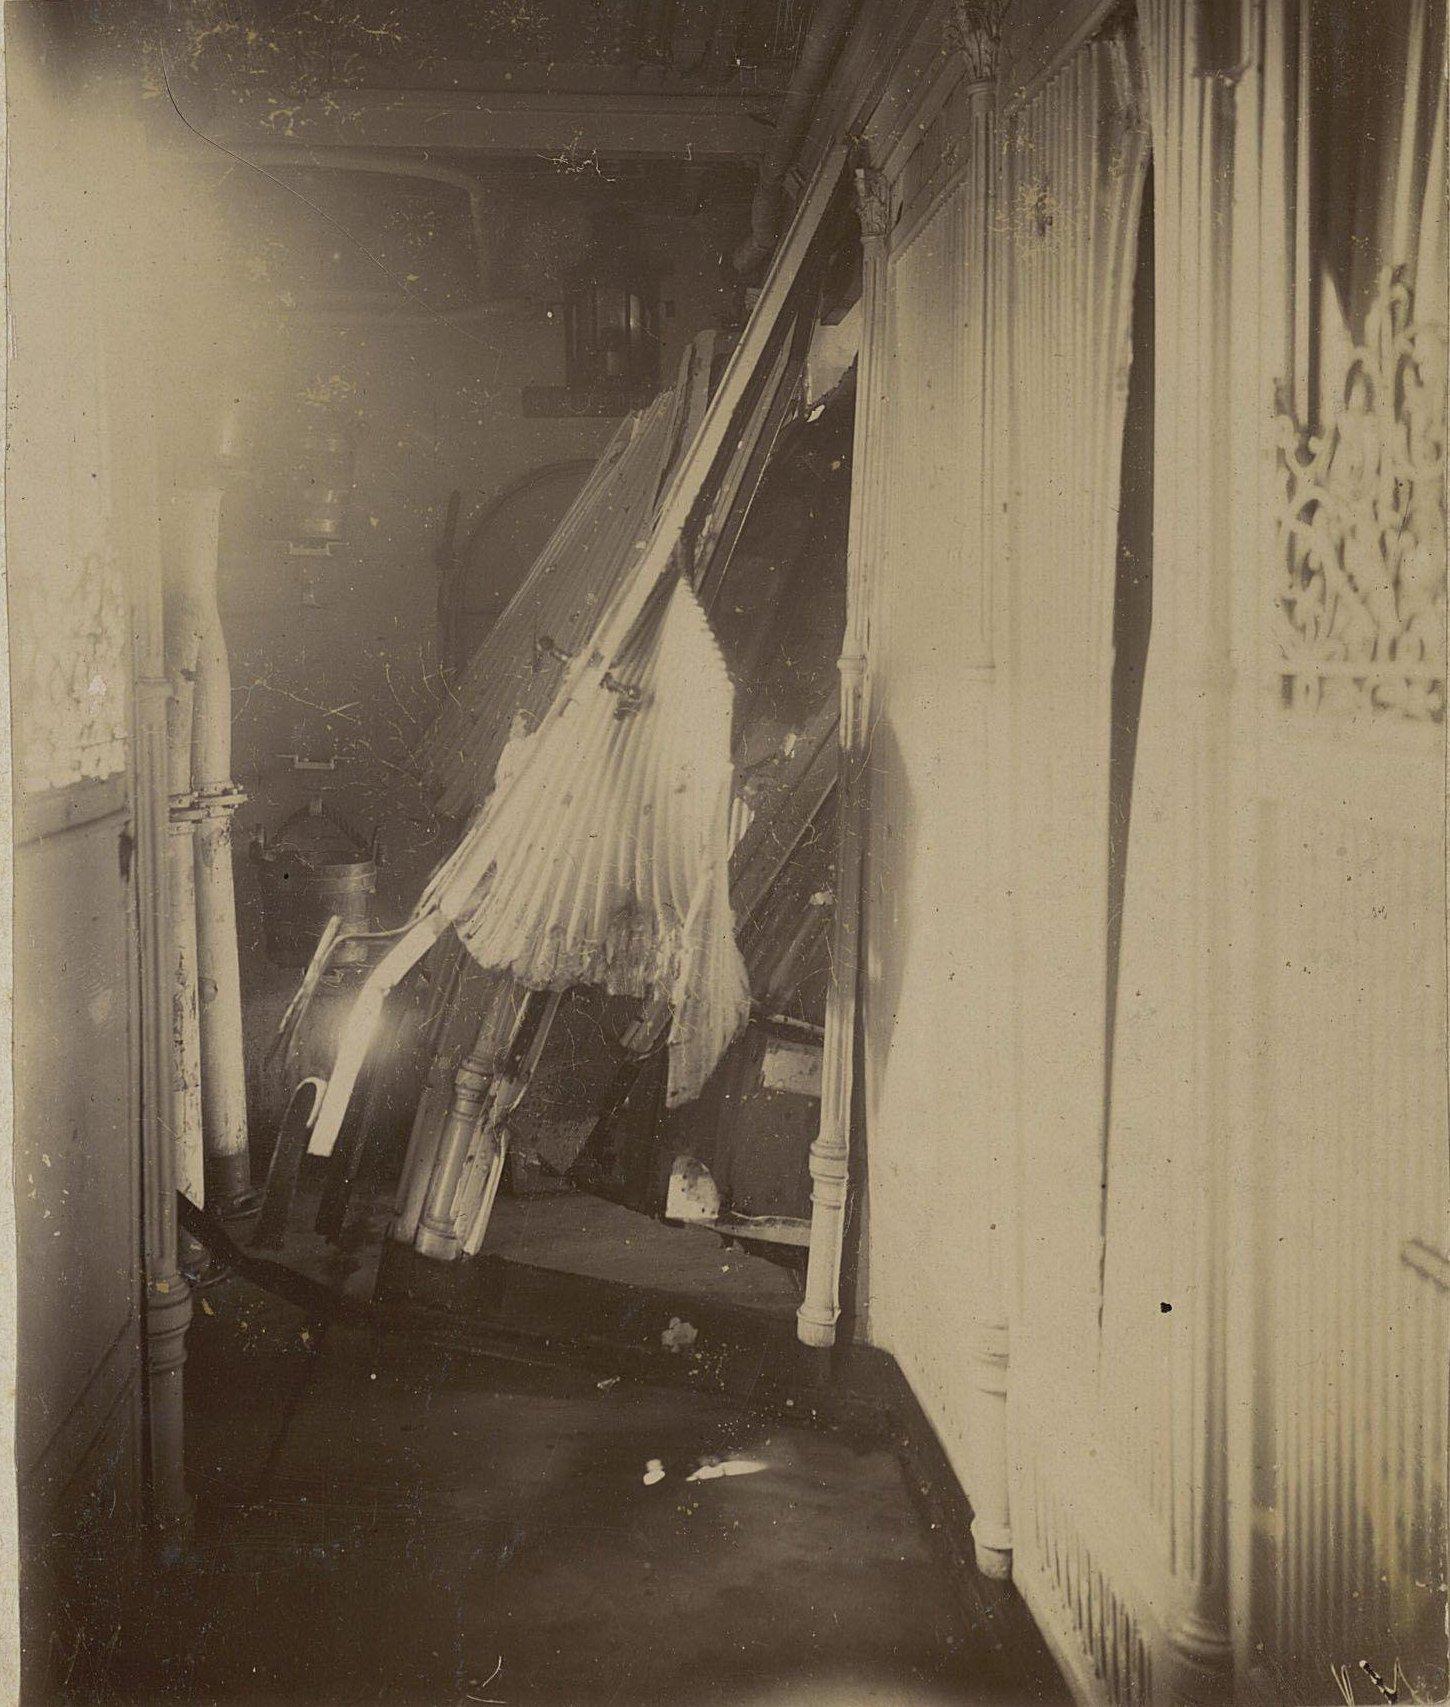 Коридор корабля со следами повреждений. 1905 г.